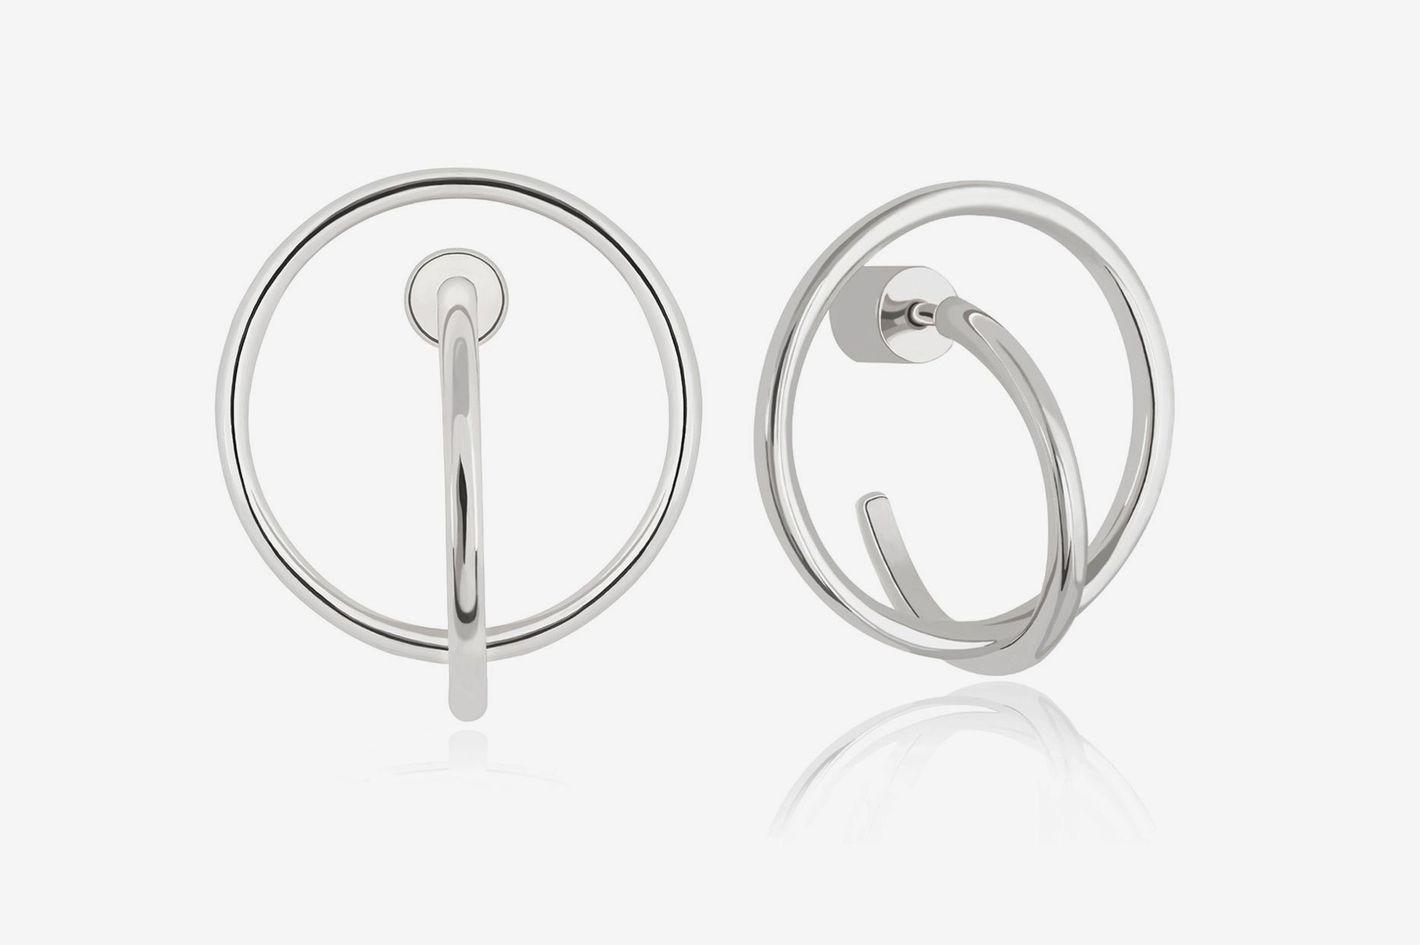 Astrid & Miyu Neptune Earrings